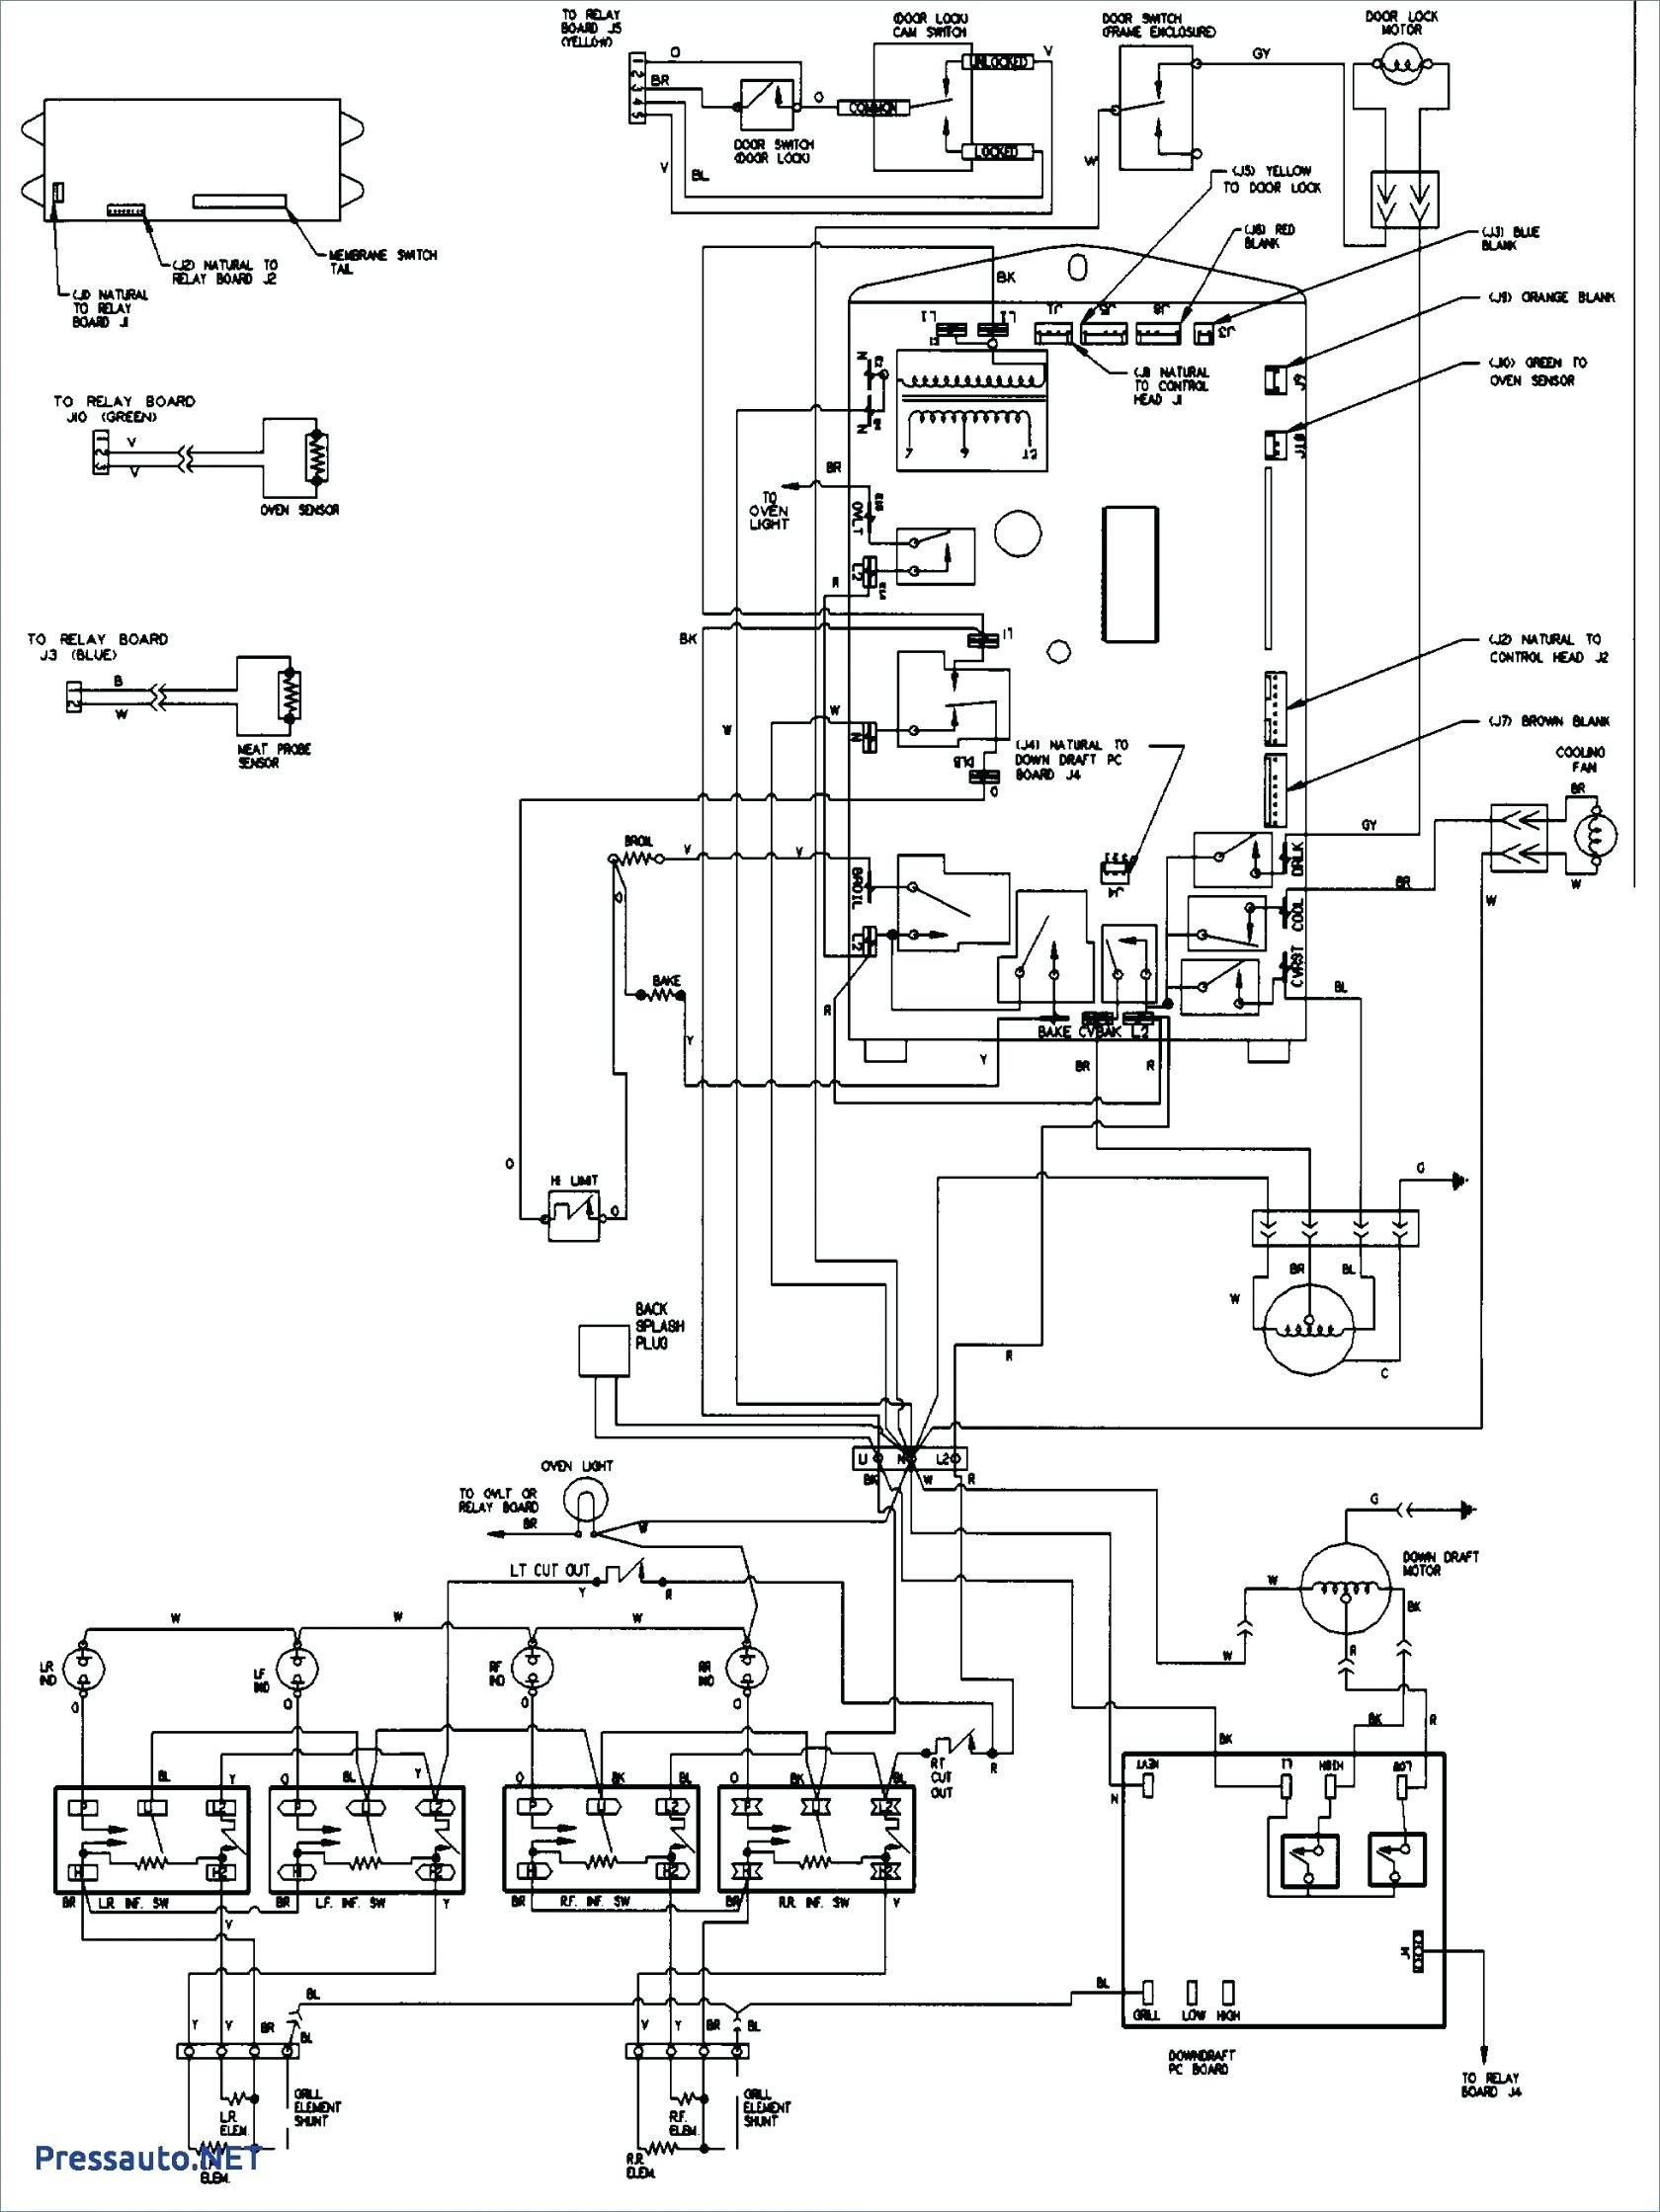 hight resolution of lennox diagram wiring furnace g12q3e137 wiring diagram datasource lennox gas furnace wiring diagram 80uhg lennox furnace